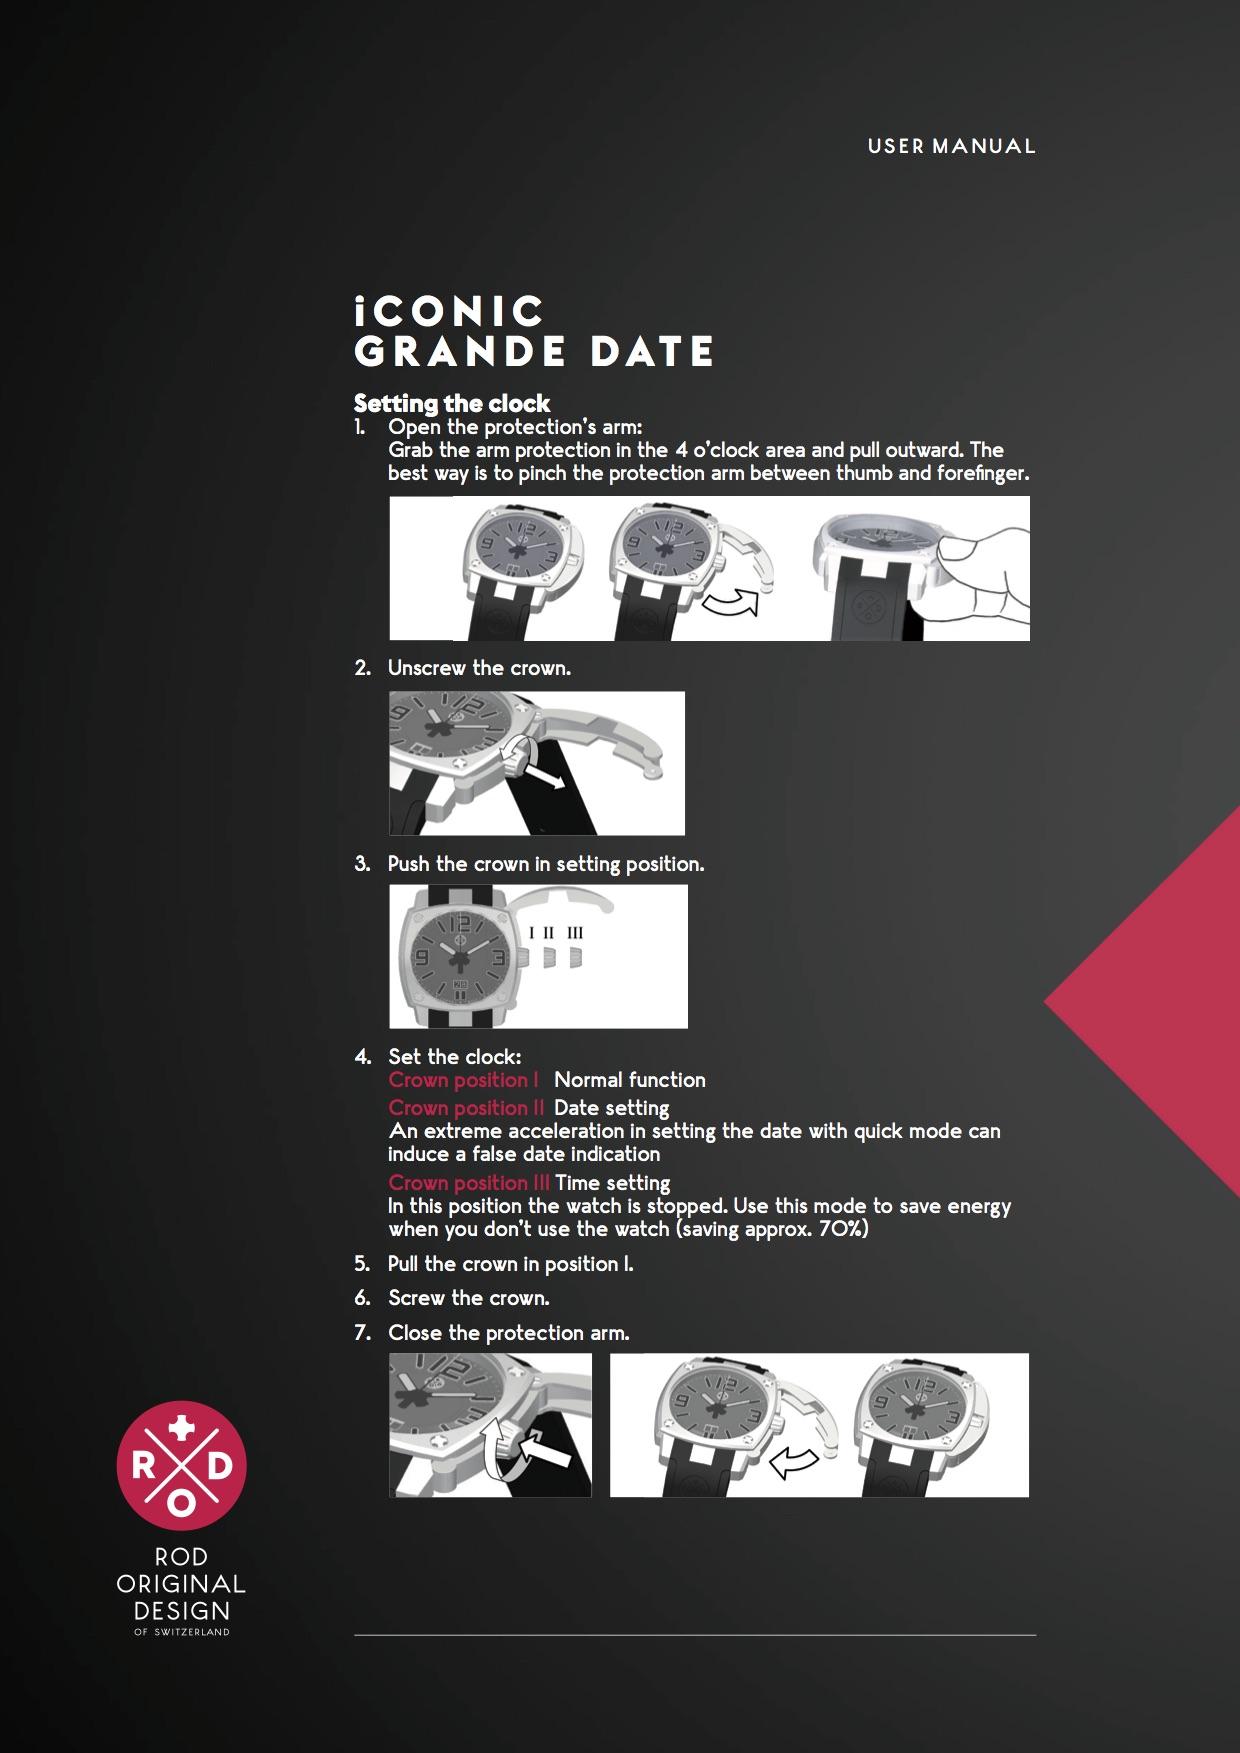 ROD user manual Grande Date